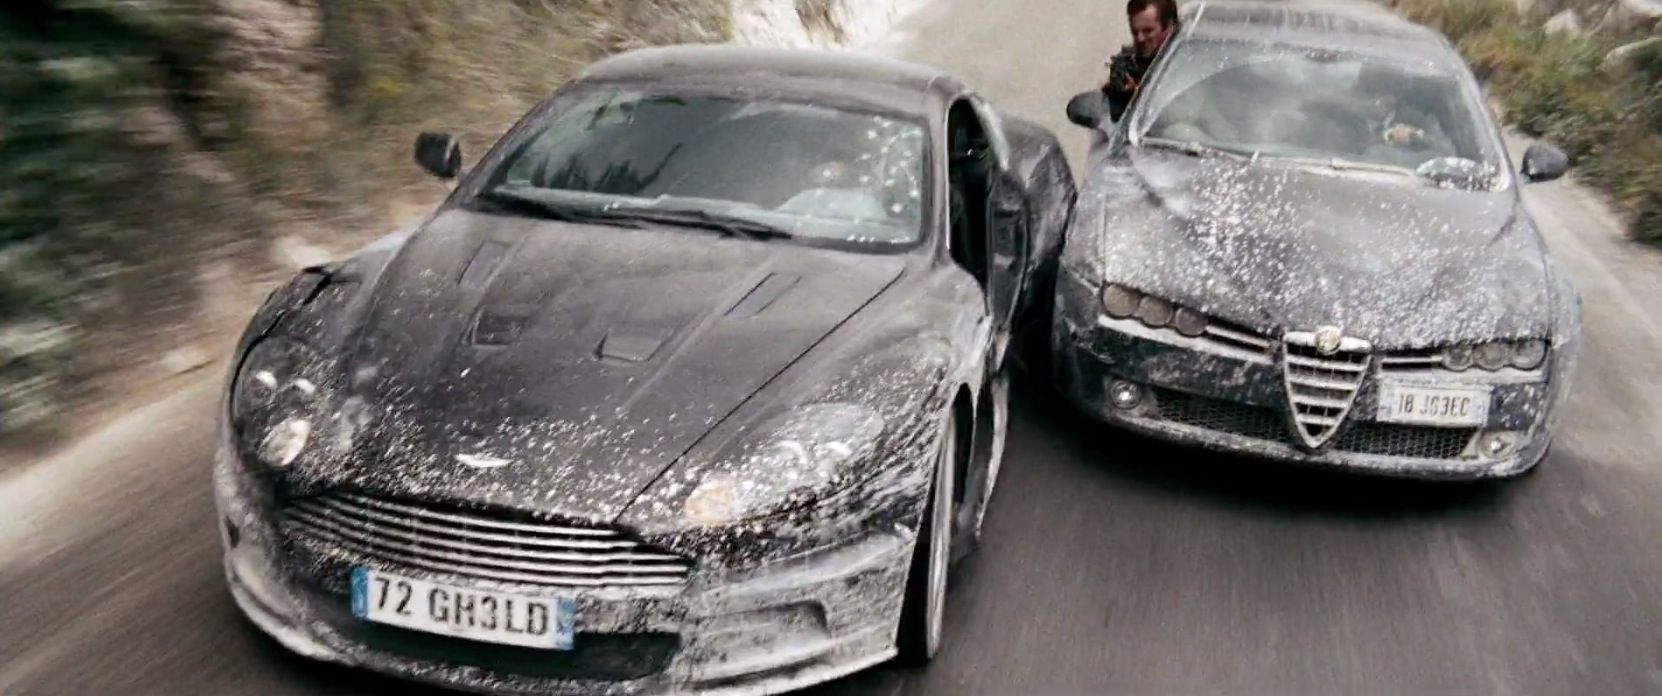 Aston Martin Dbs 2008 And Alfa Romeo 159 2008 Cars In